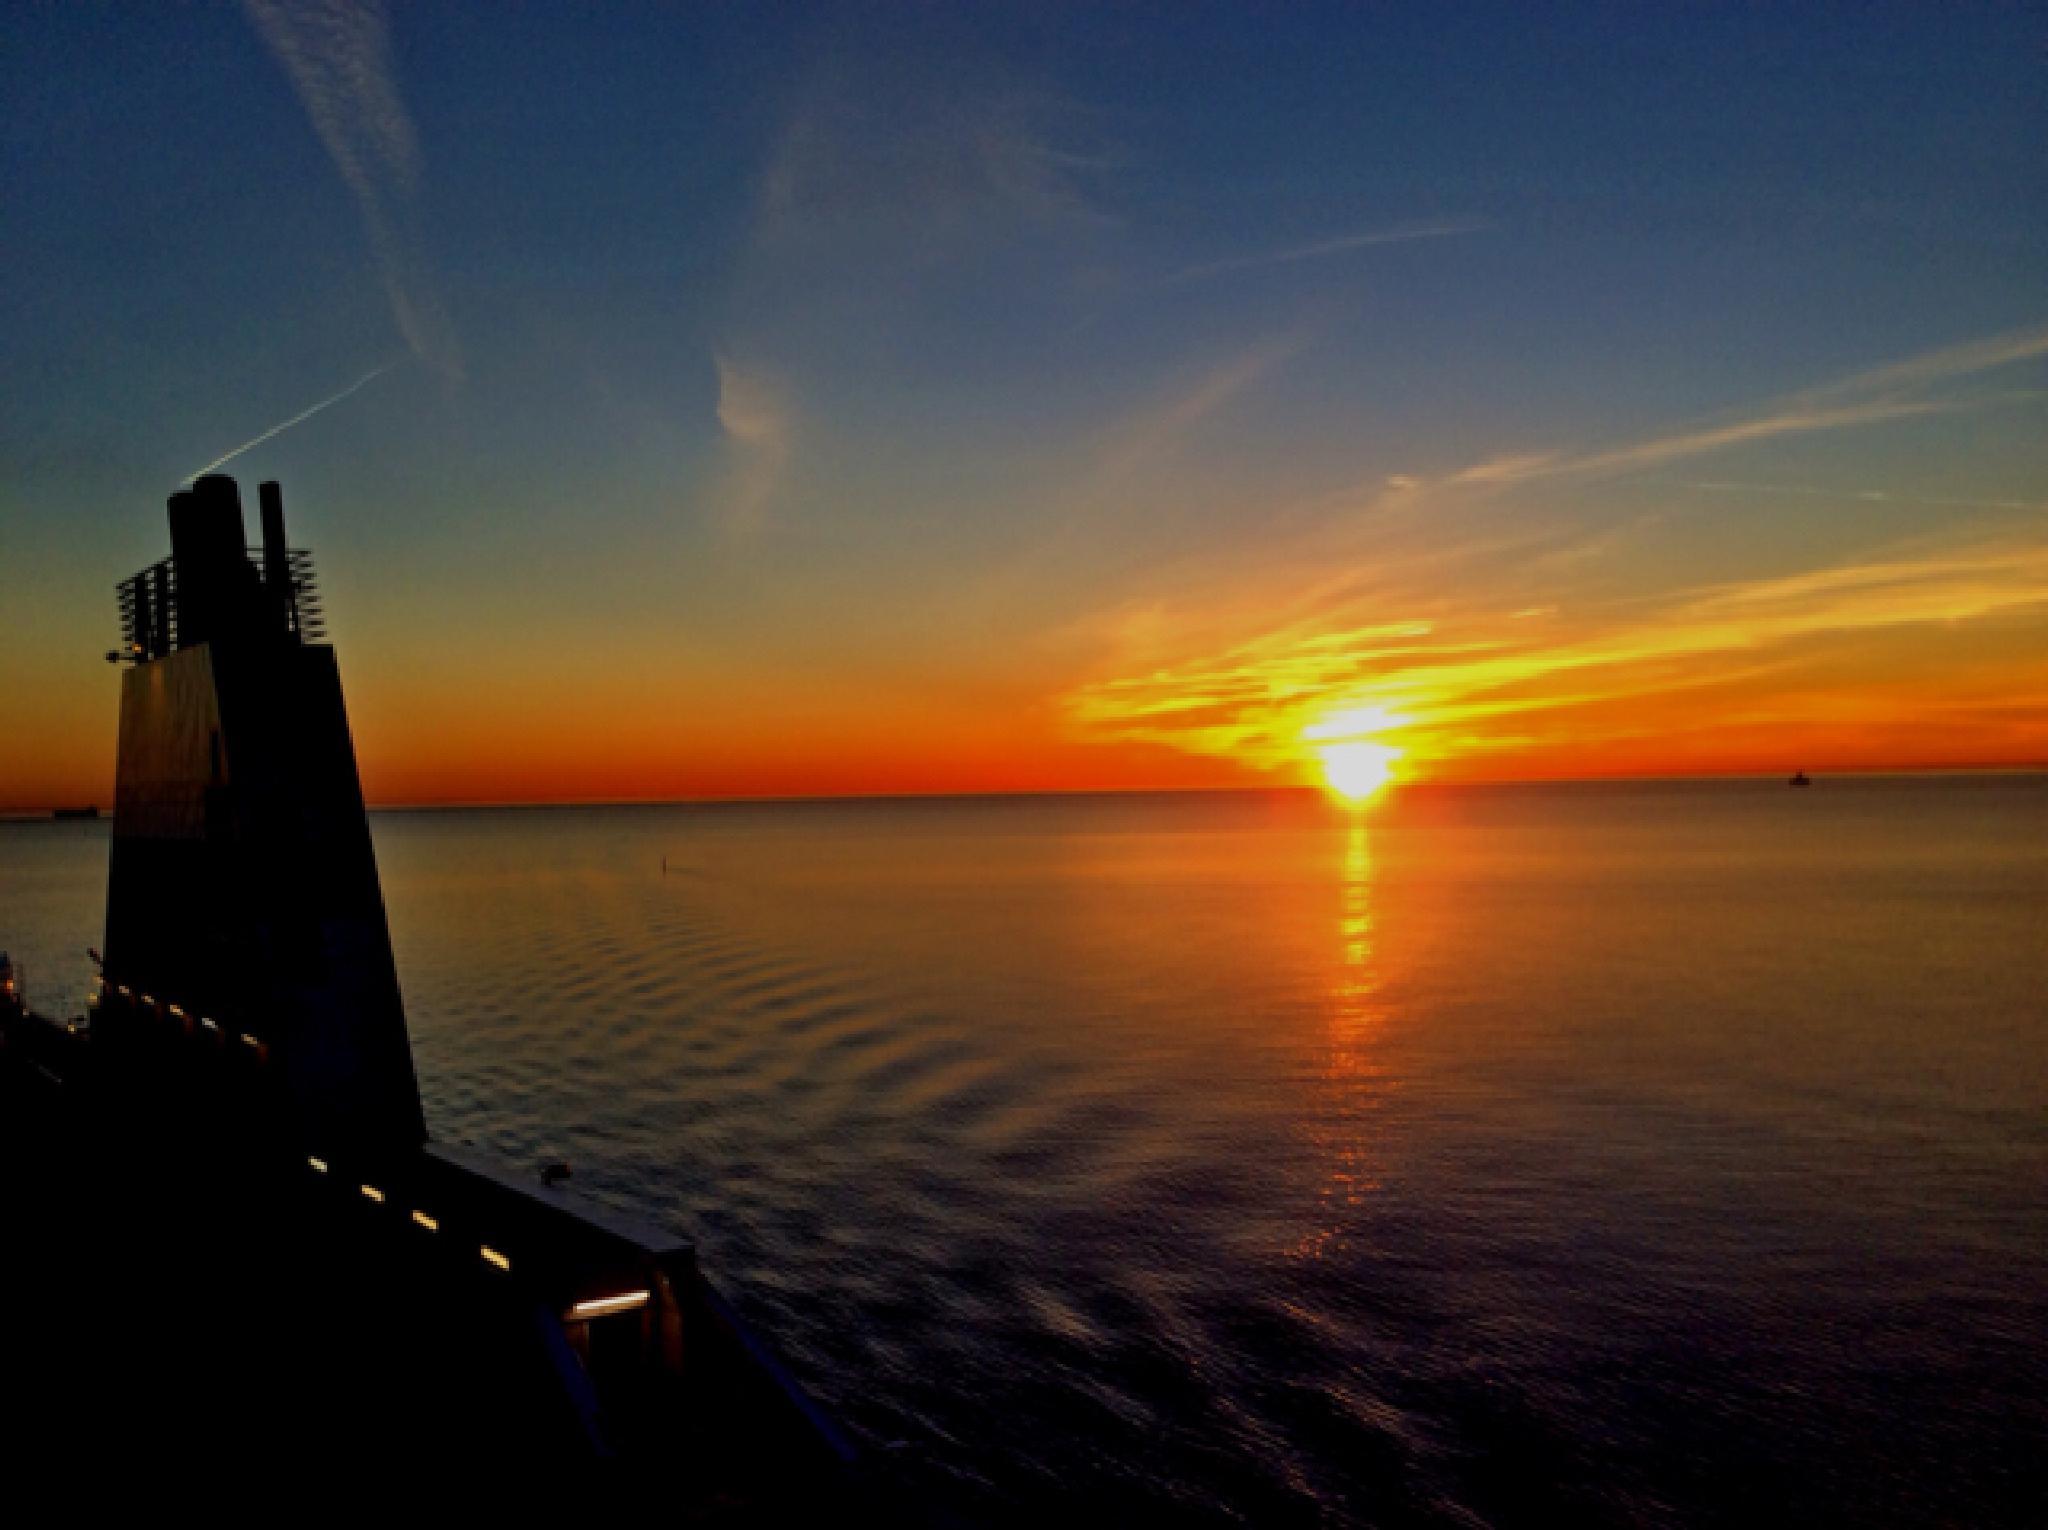 Warms My heart @ Sea  by Johan Meding